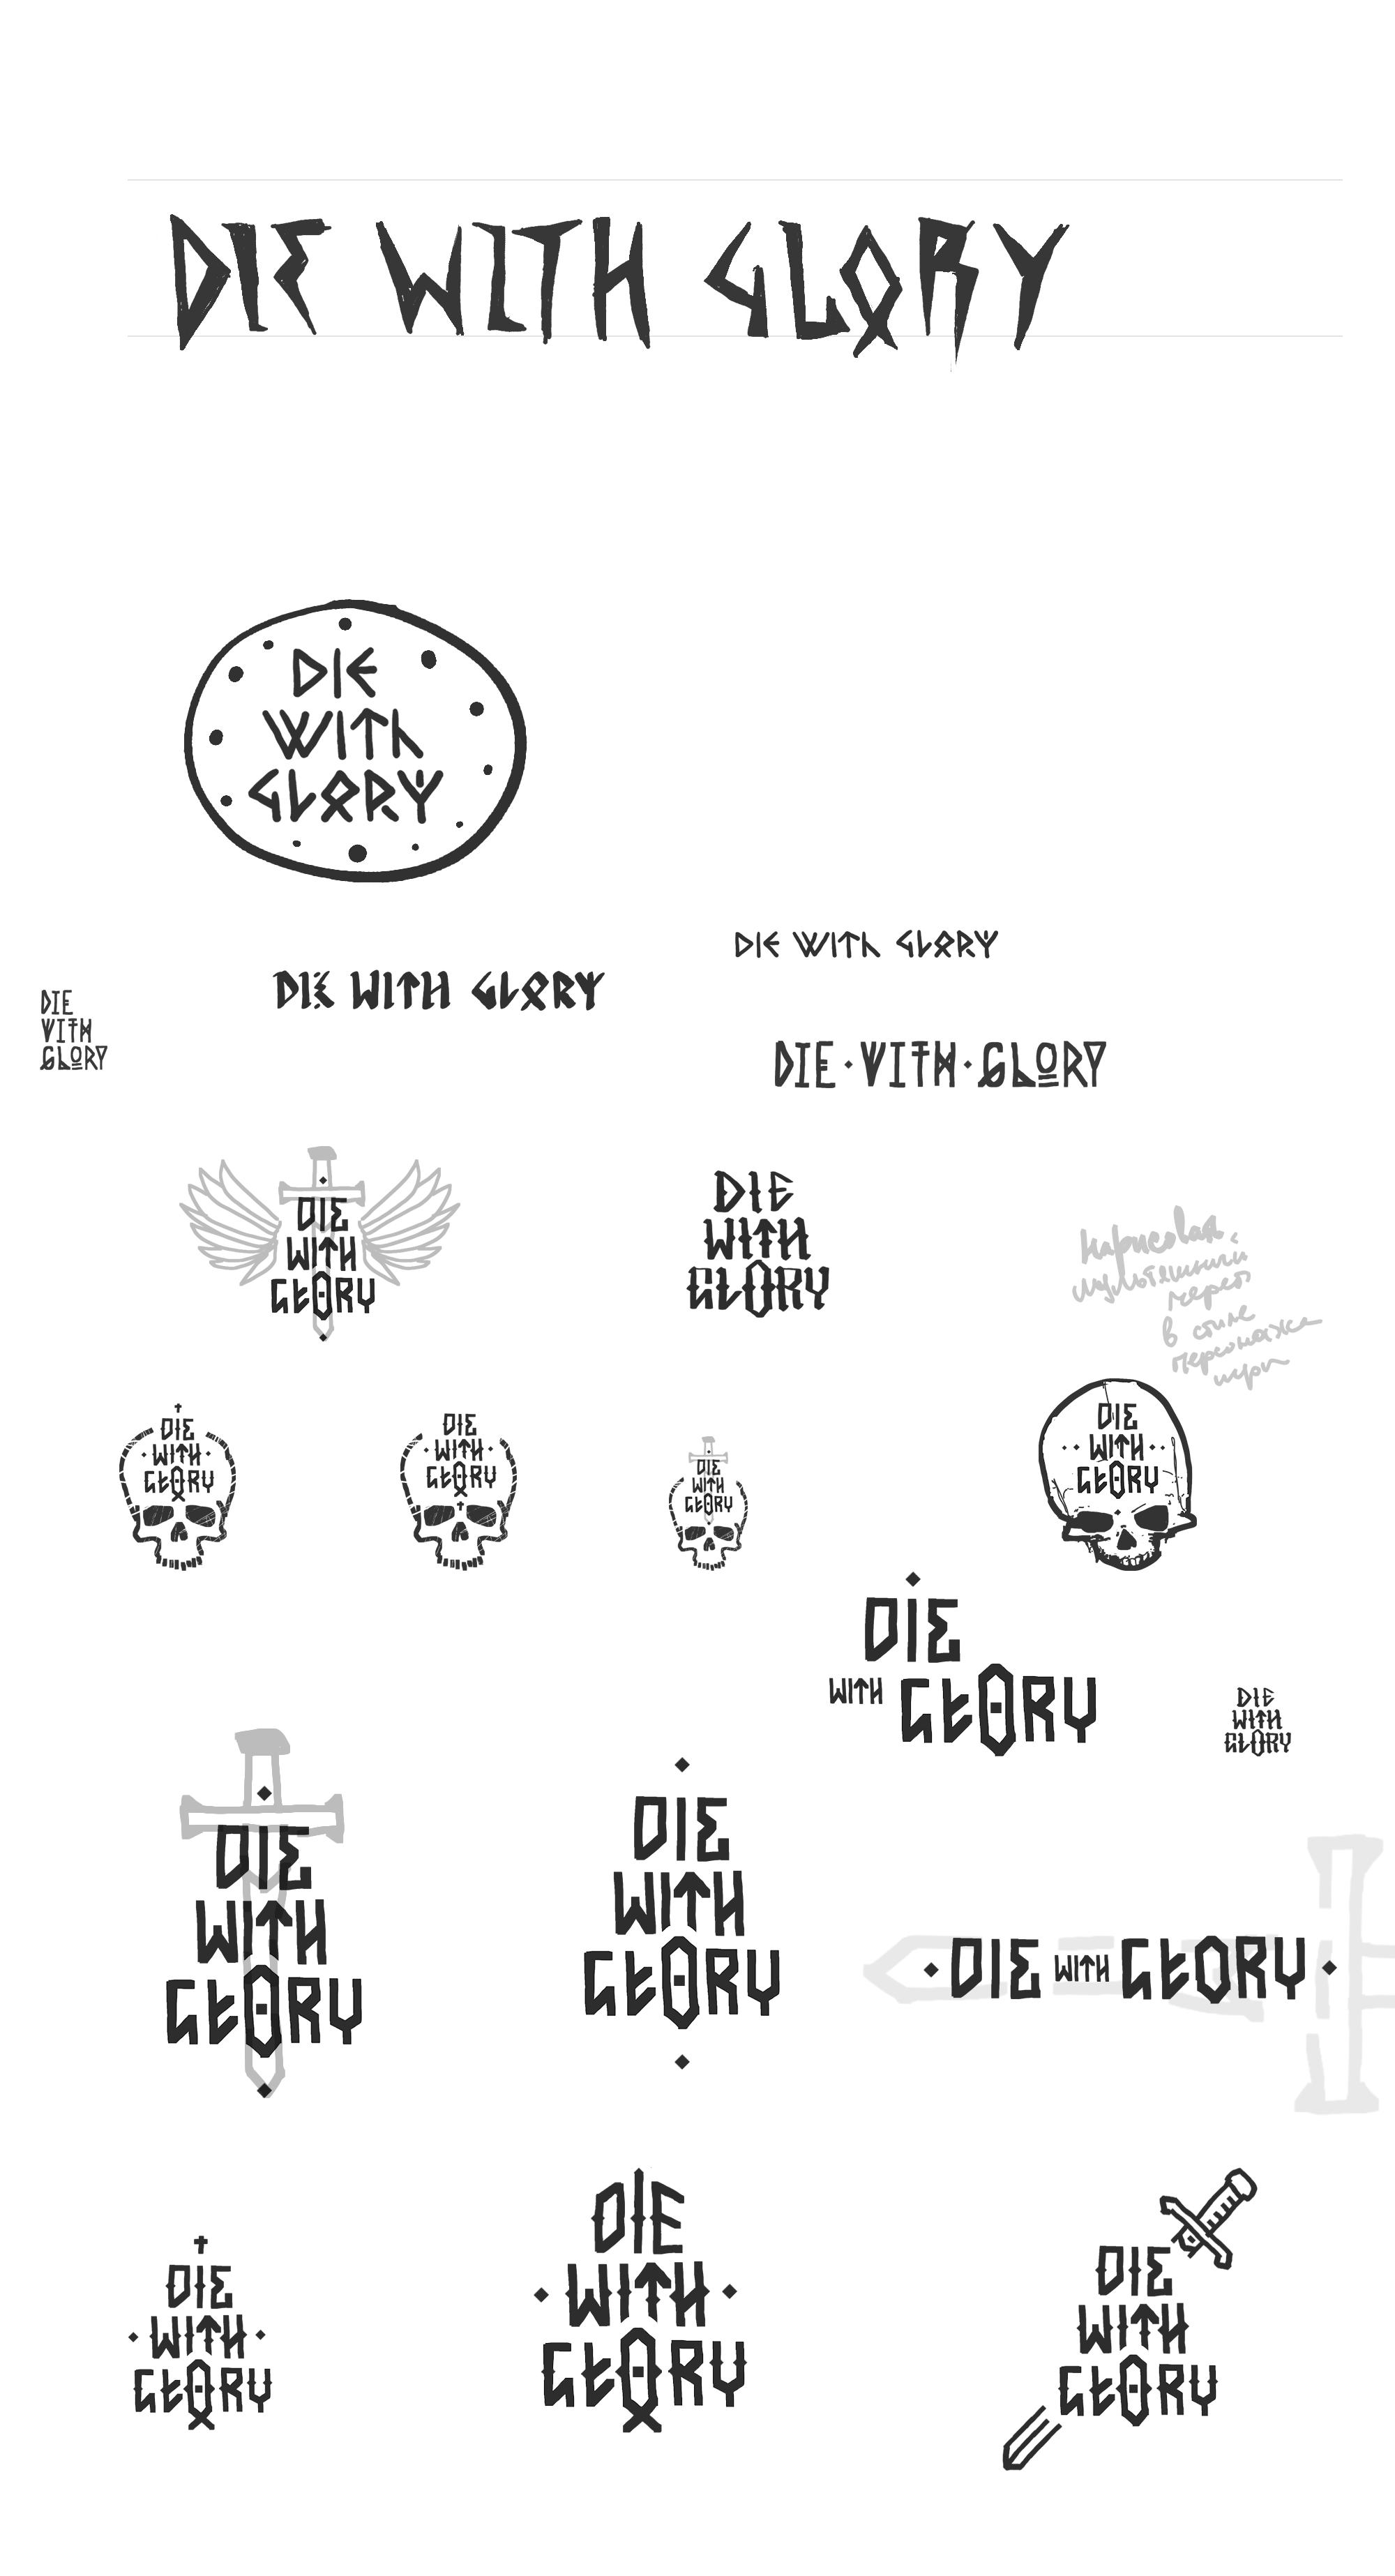 Die With Glory – скетчи логотипа. - Изображение 5